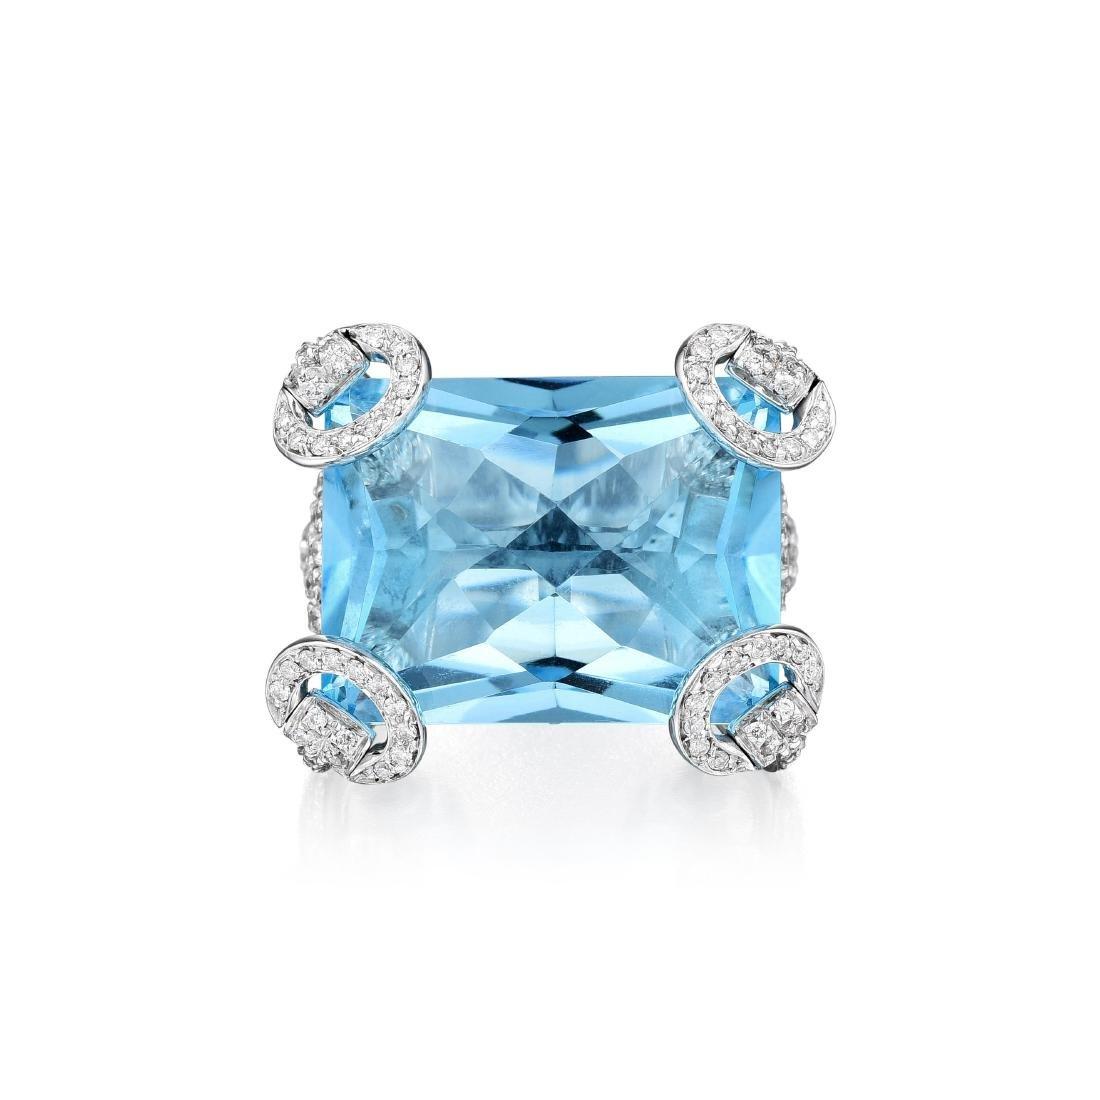 Gucci Topaz and Diamond Horsebit Ring